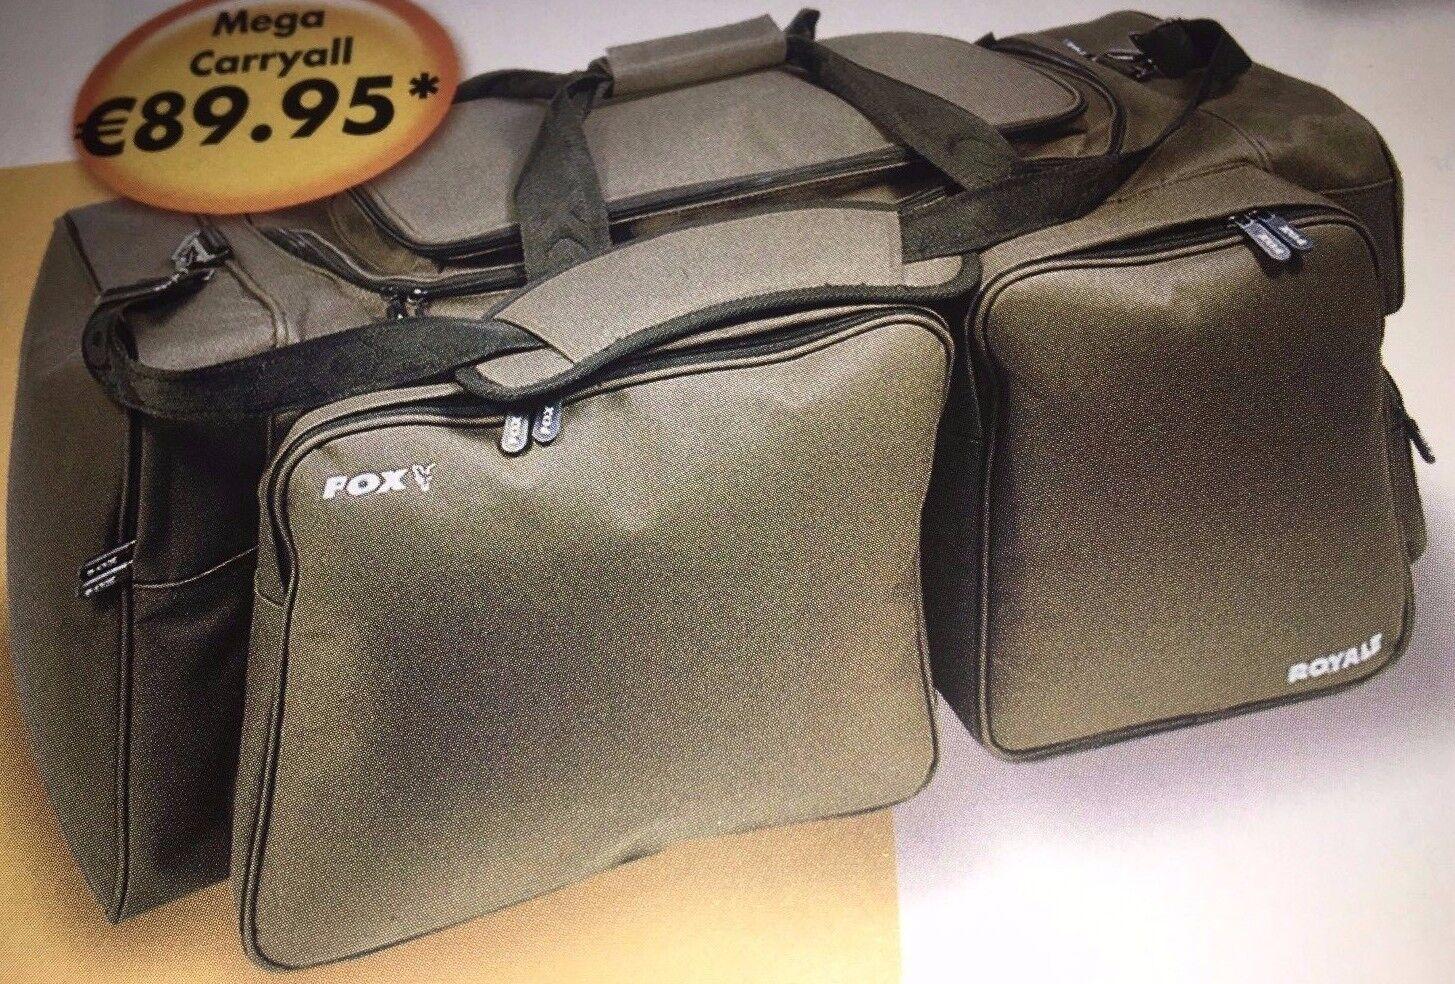 Fox Mega Carryall Neu OVP LU 2838